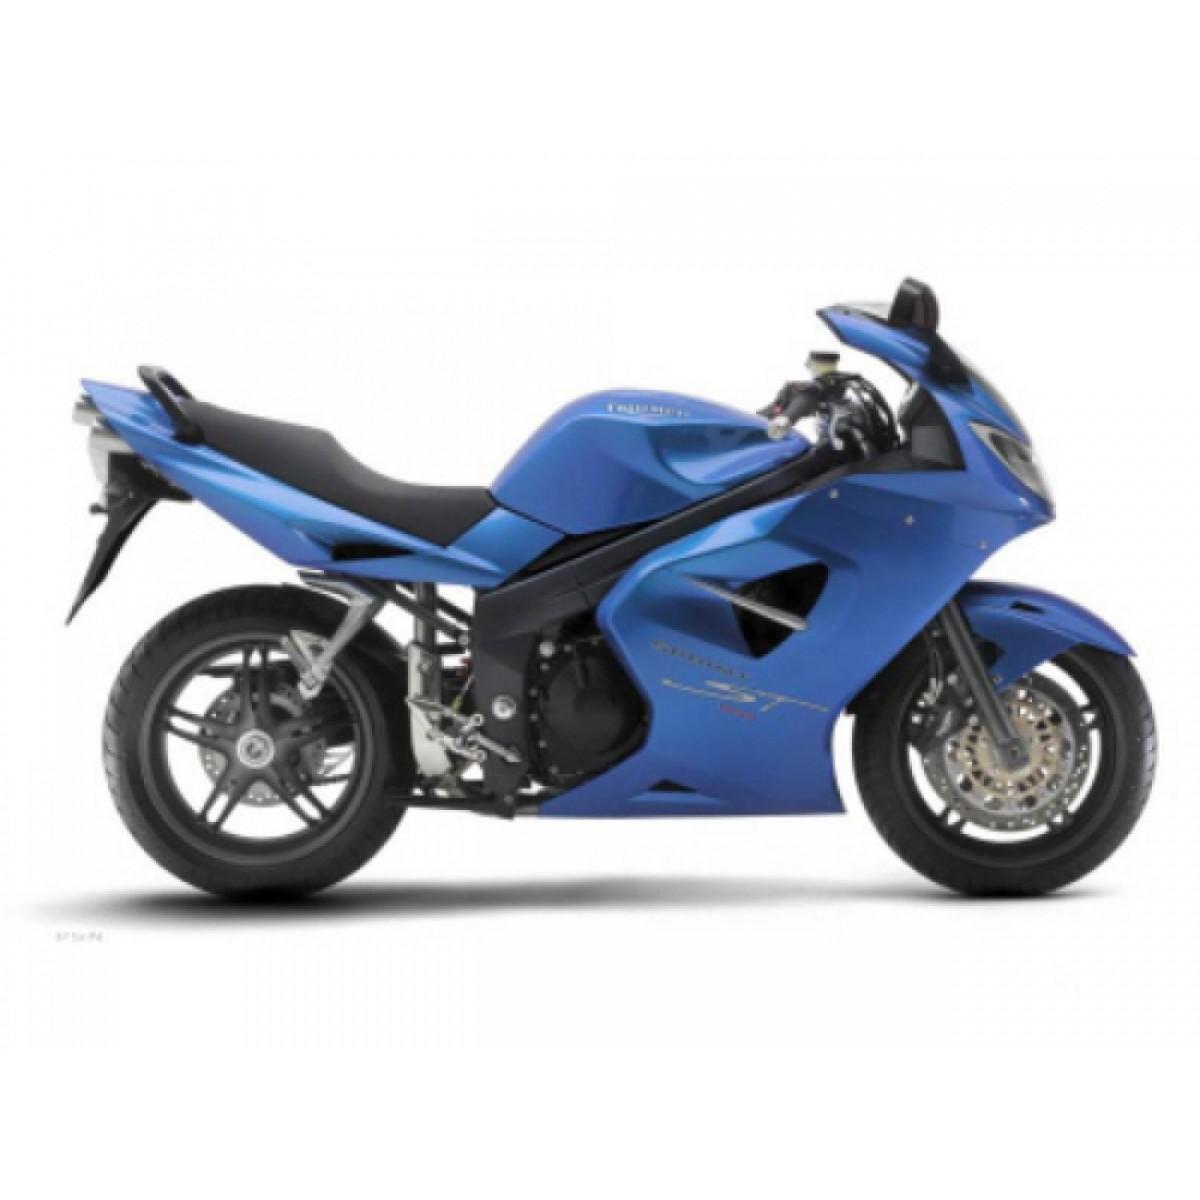 Kit Adesivos Triumph 1050 Sprint St 1050 Azul Decalx